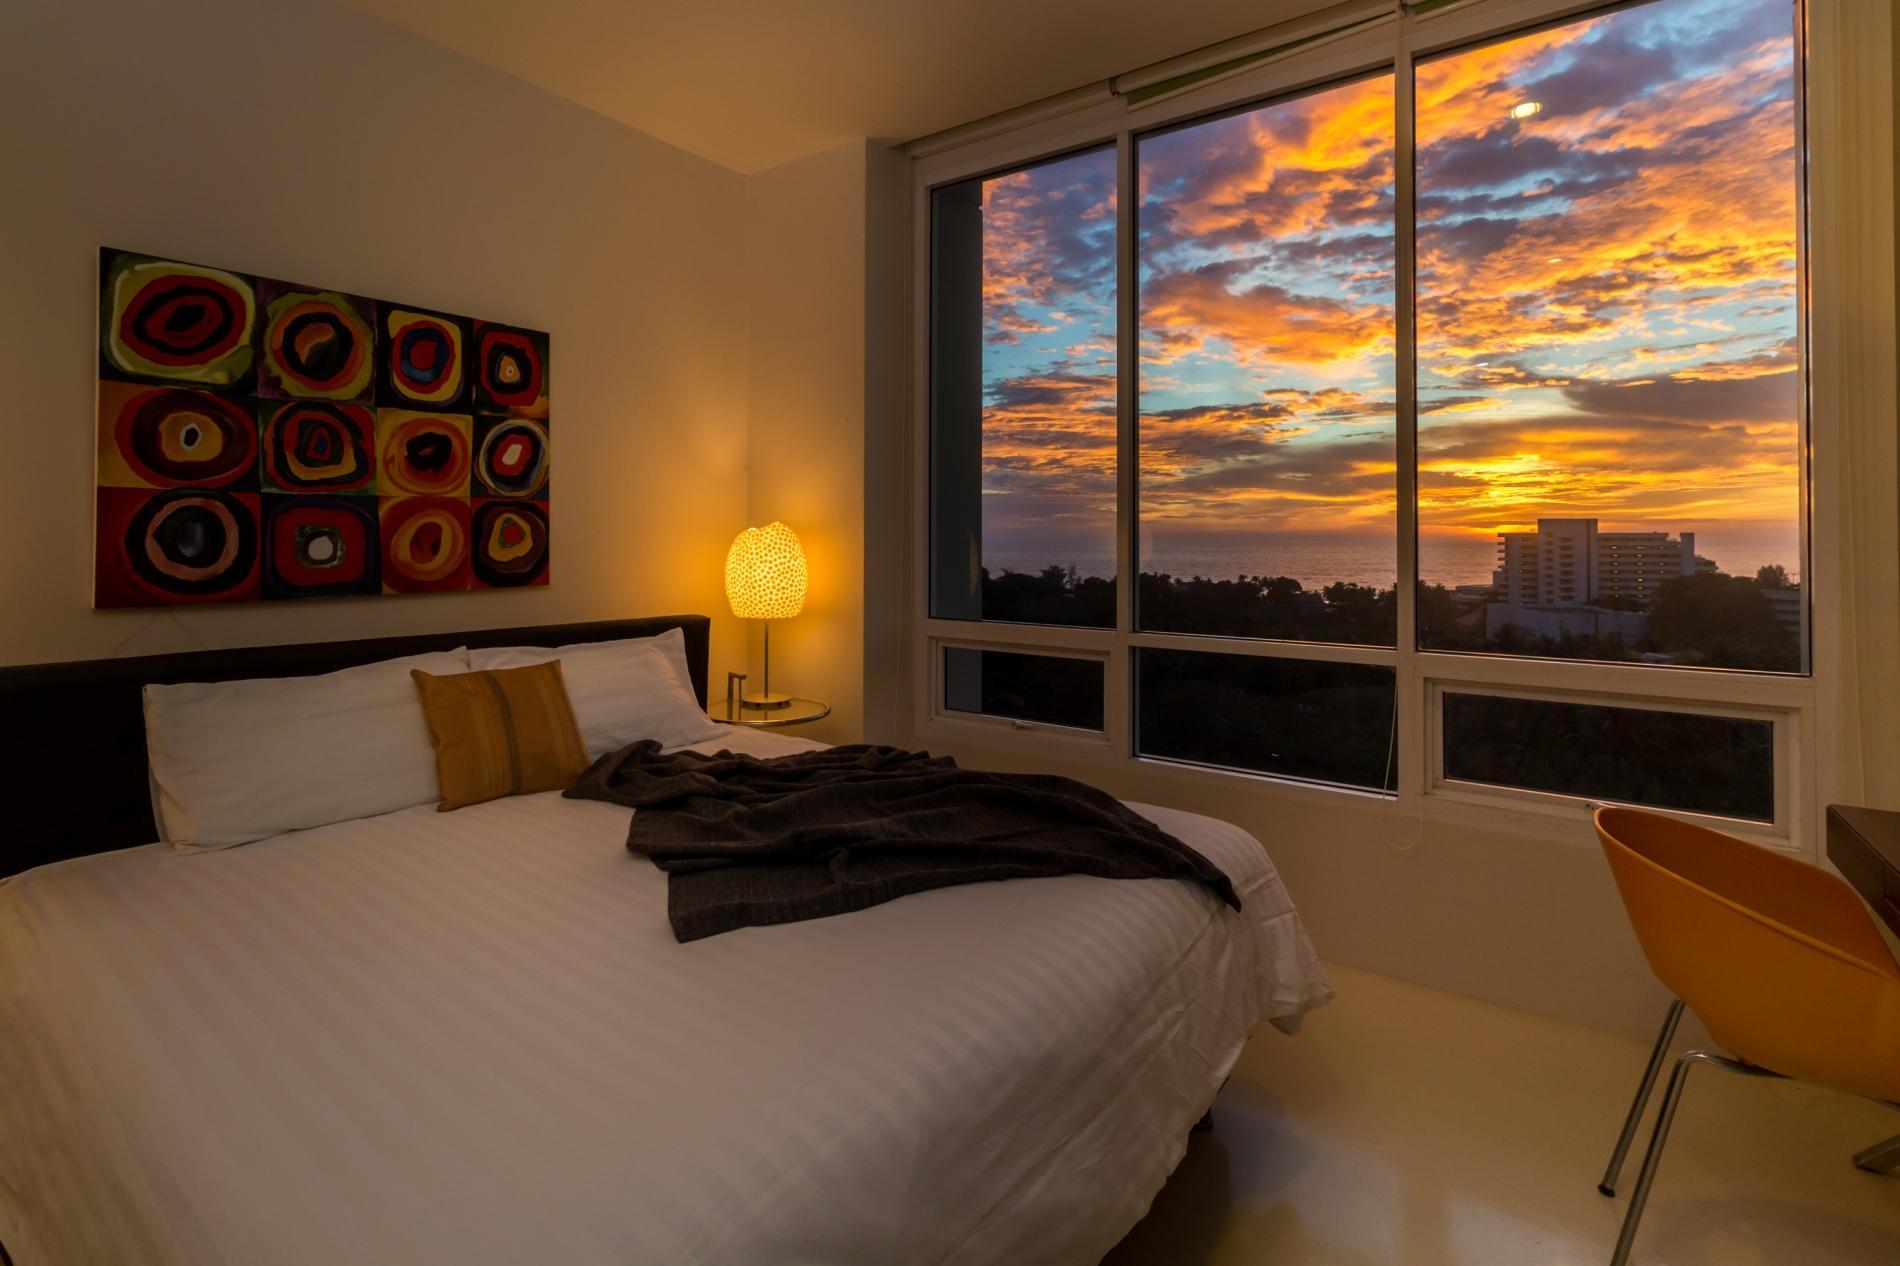 Apartment KH2605 - Sea-view Penthouse in Karon  walk to beach  restaurants  bars  shops photo 20390394